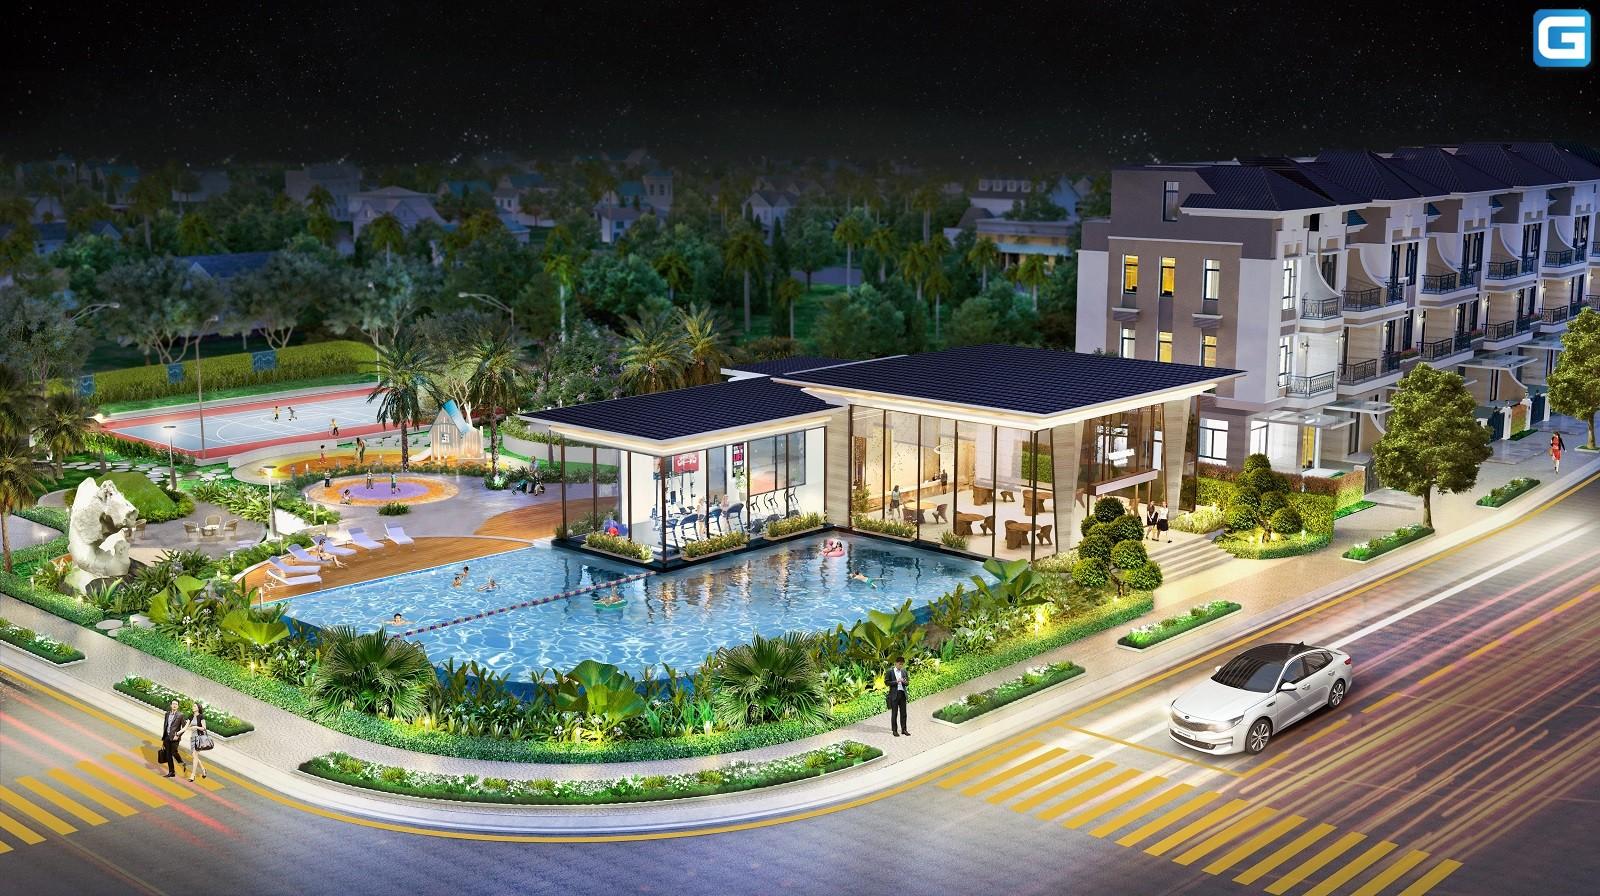 dự án Verosa Park khang điền quận 9